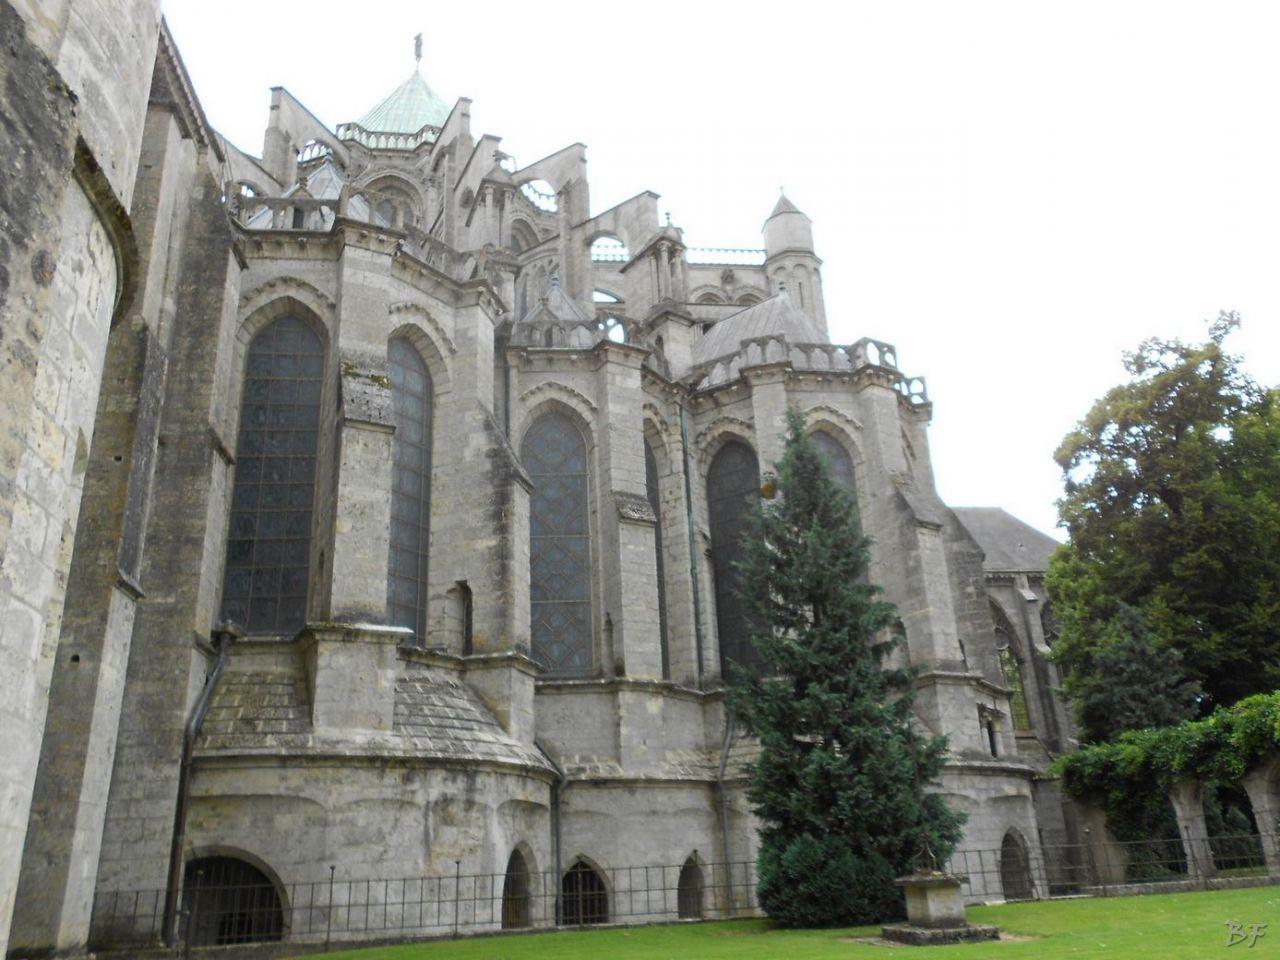 Cattedrale-Gotica-della-Vergine-Chartres-Eure-et-Loir-Centre-Val-de-Loire-Francia-1